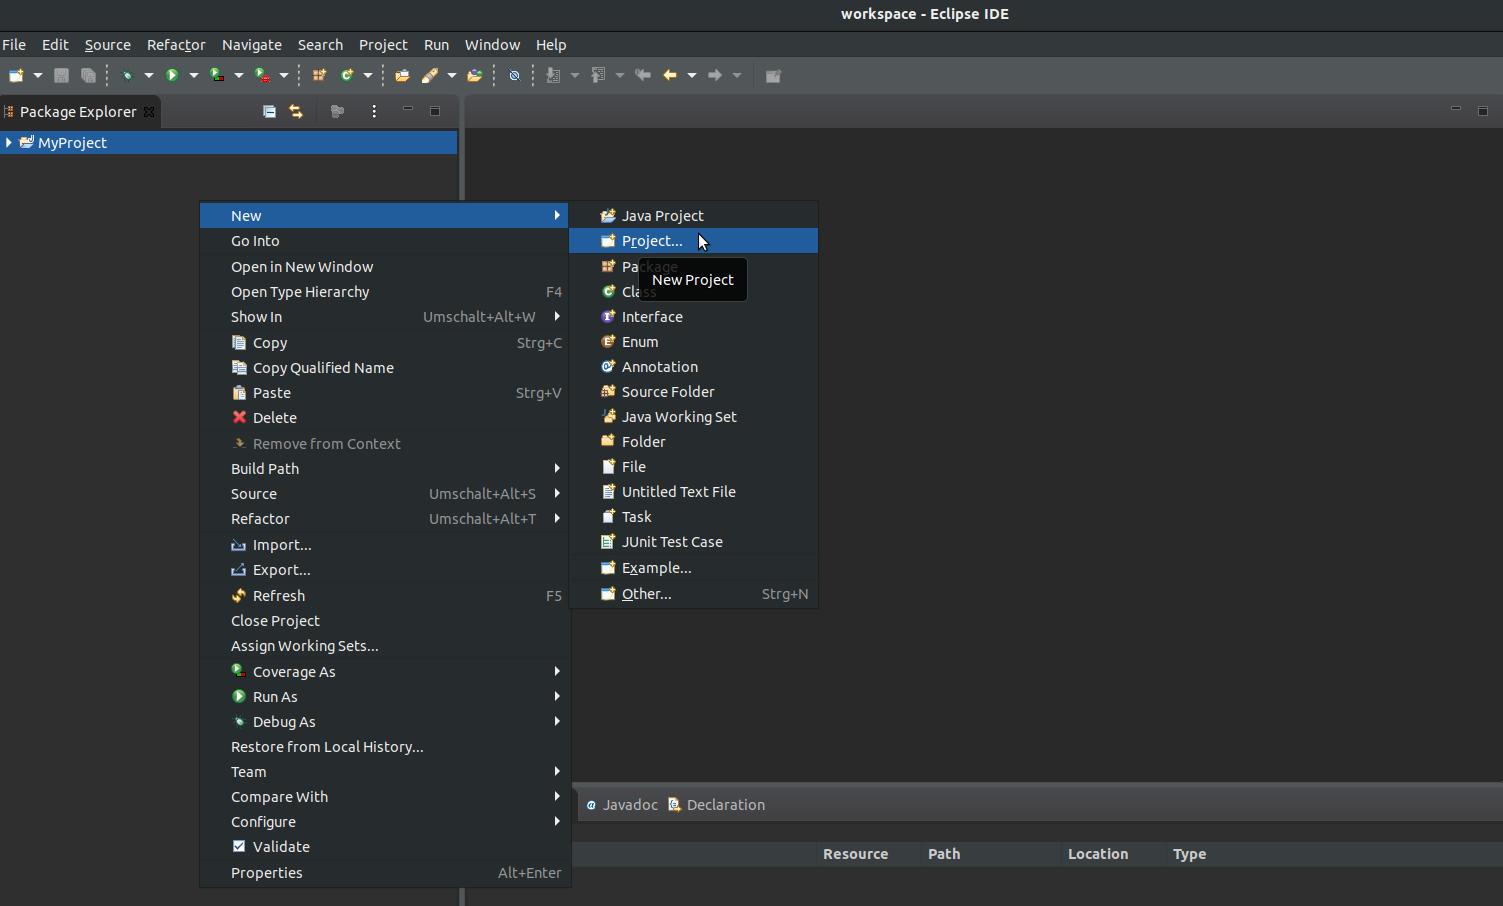 TweetyProject - Documentation - Install Eclipse